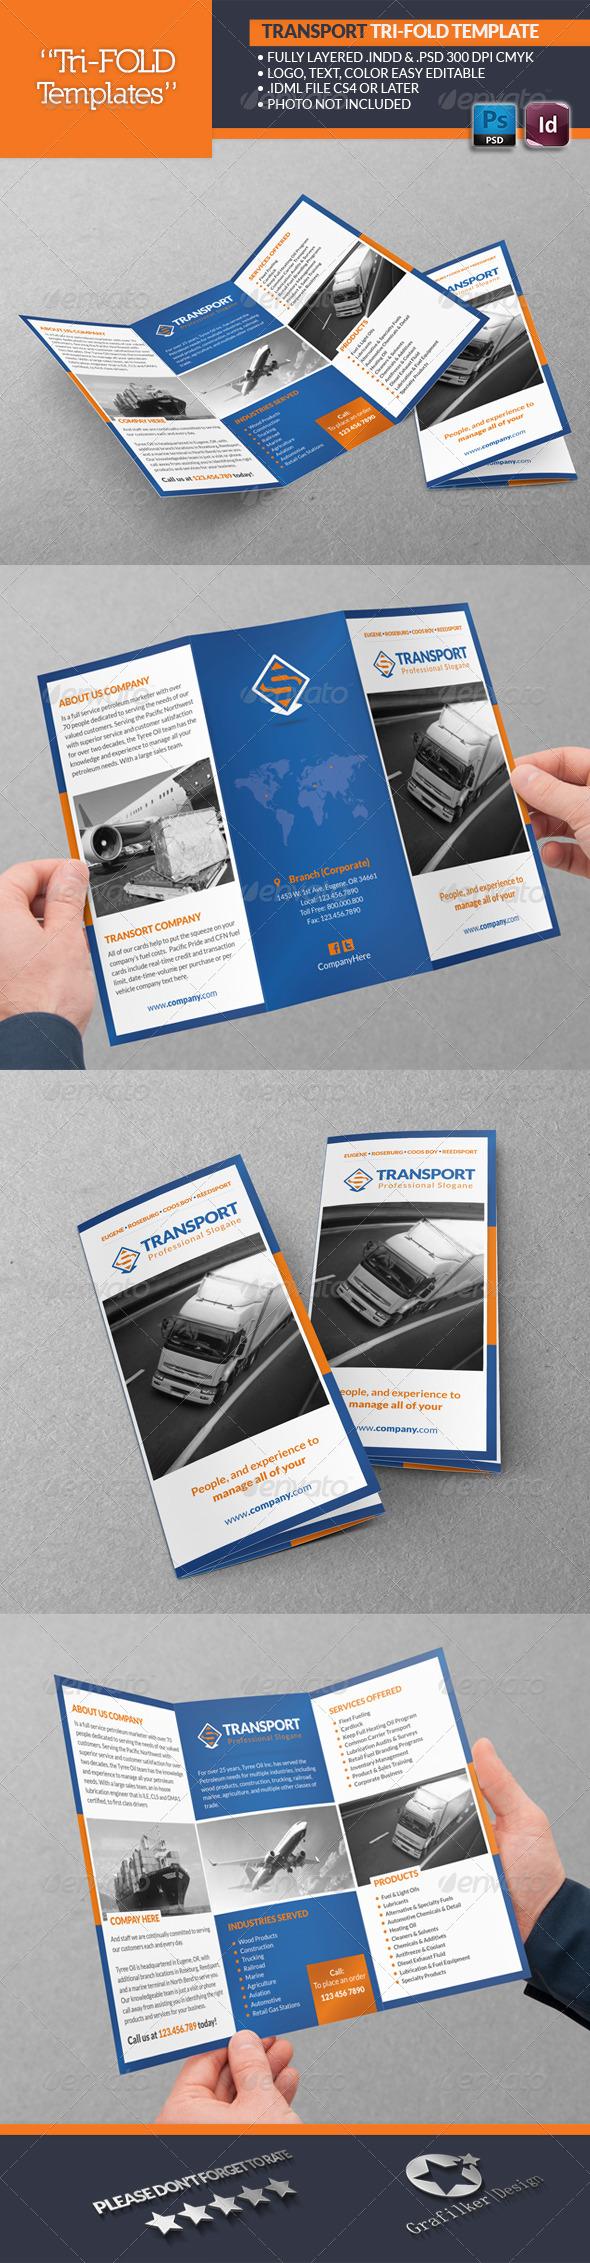 GraphicRiver Transport Tri-Fold Templates 6908612